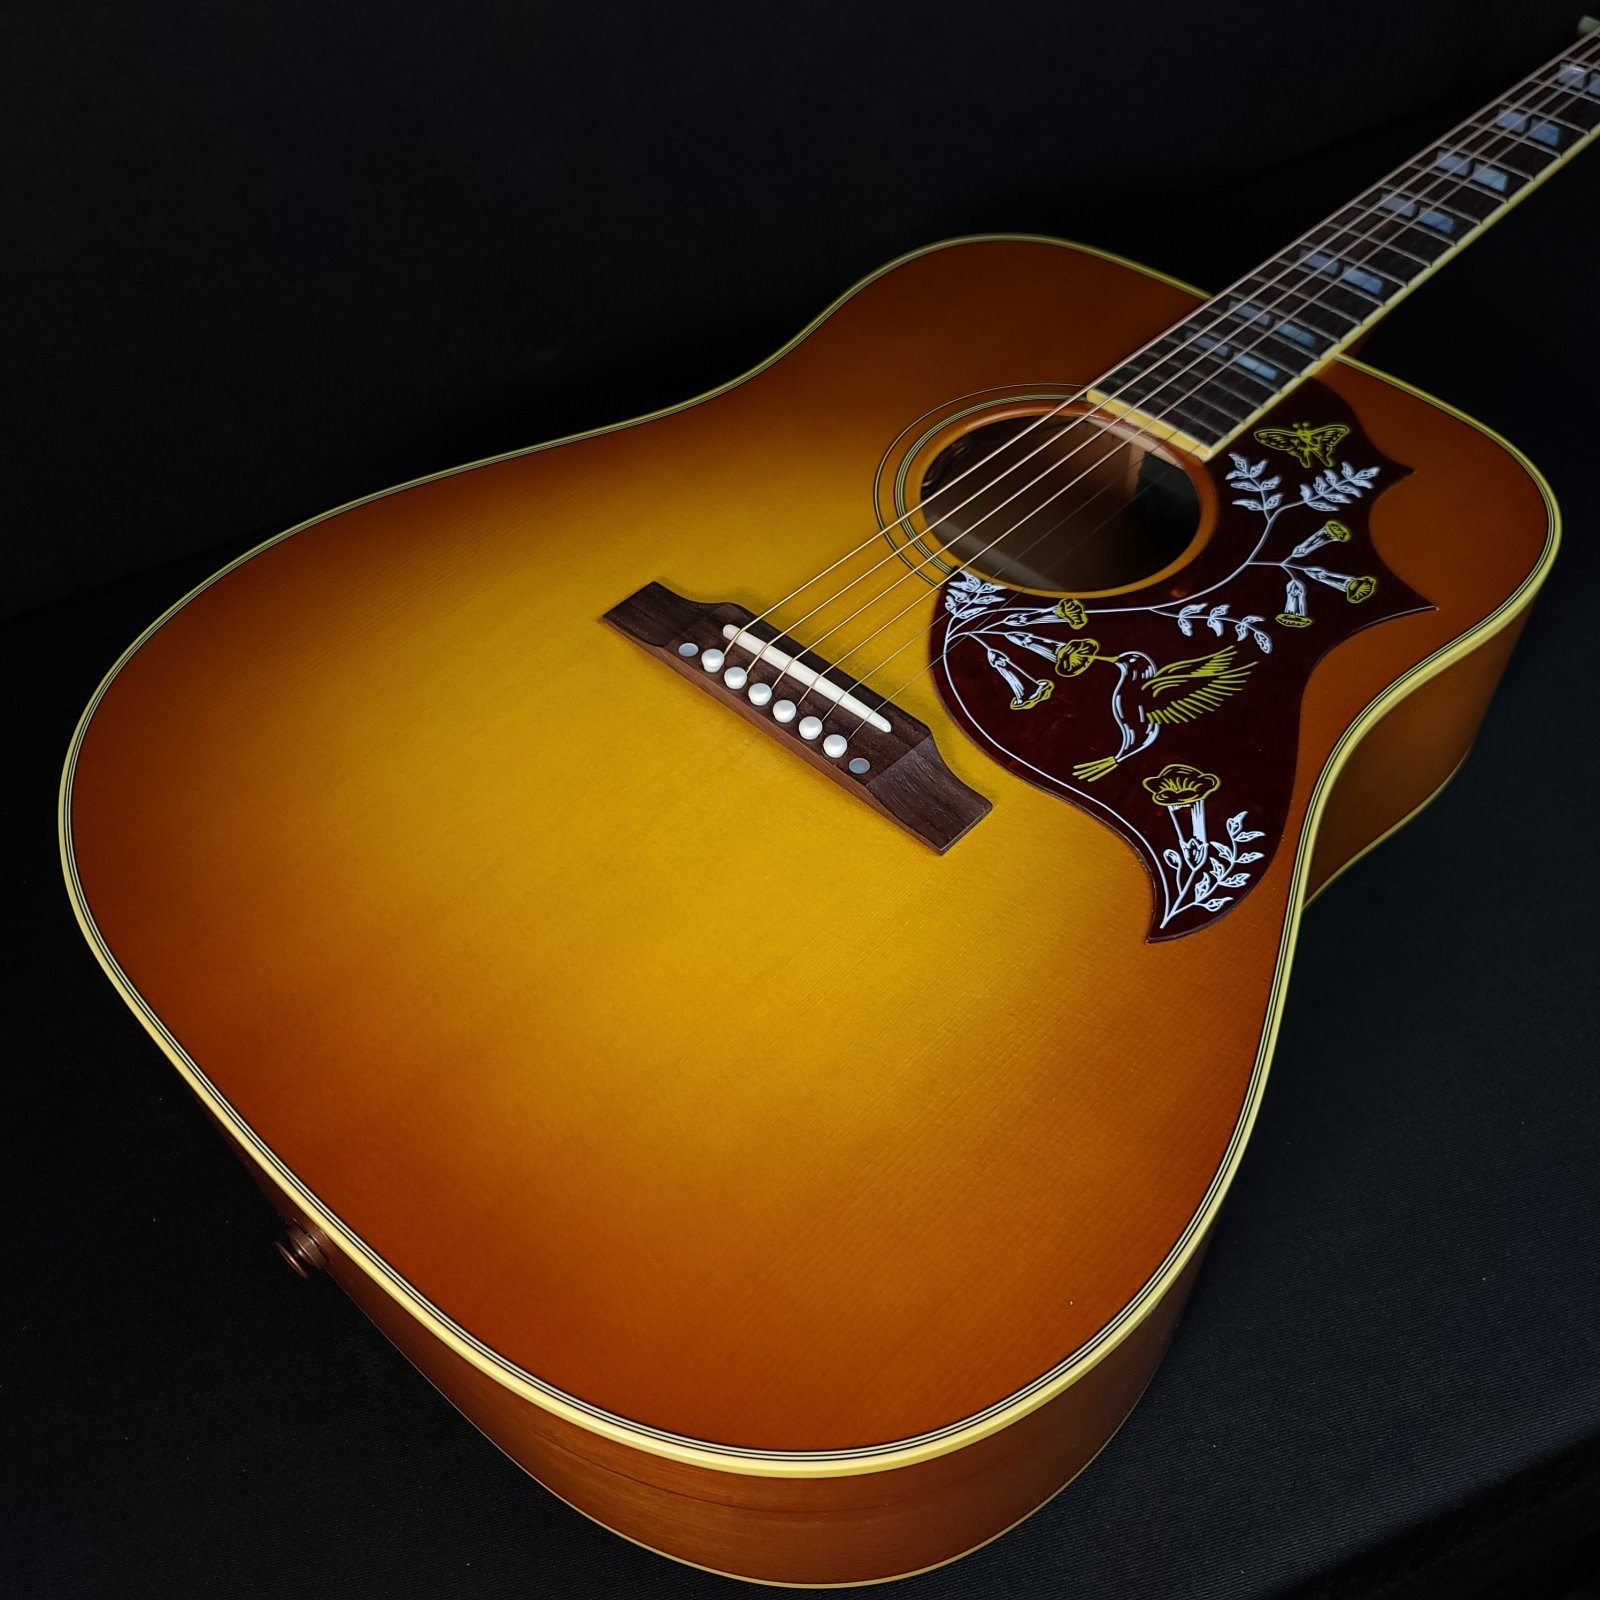 Gibson Hummingbird Original Acoustic Guitar Heritage Cherry Sunburst with Case